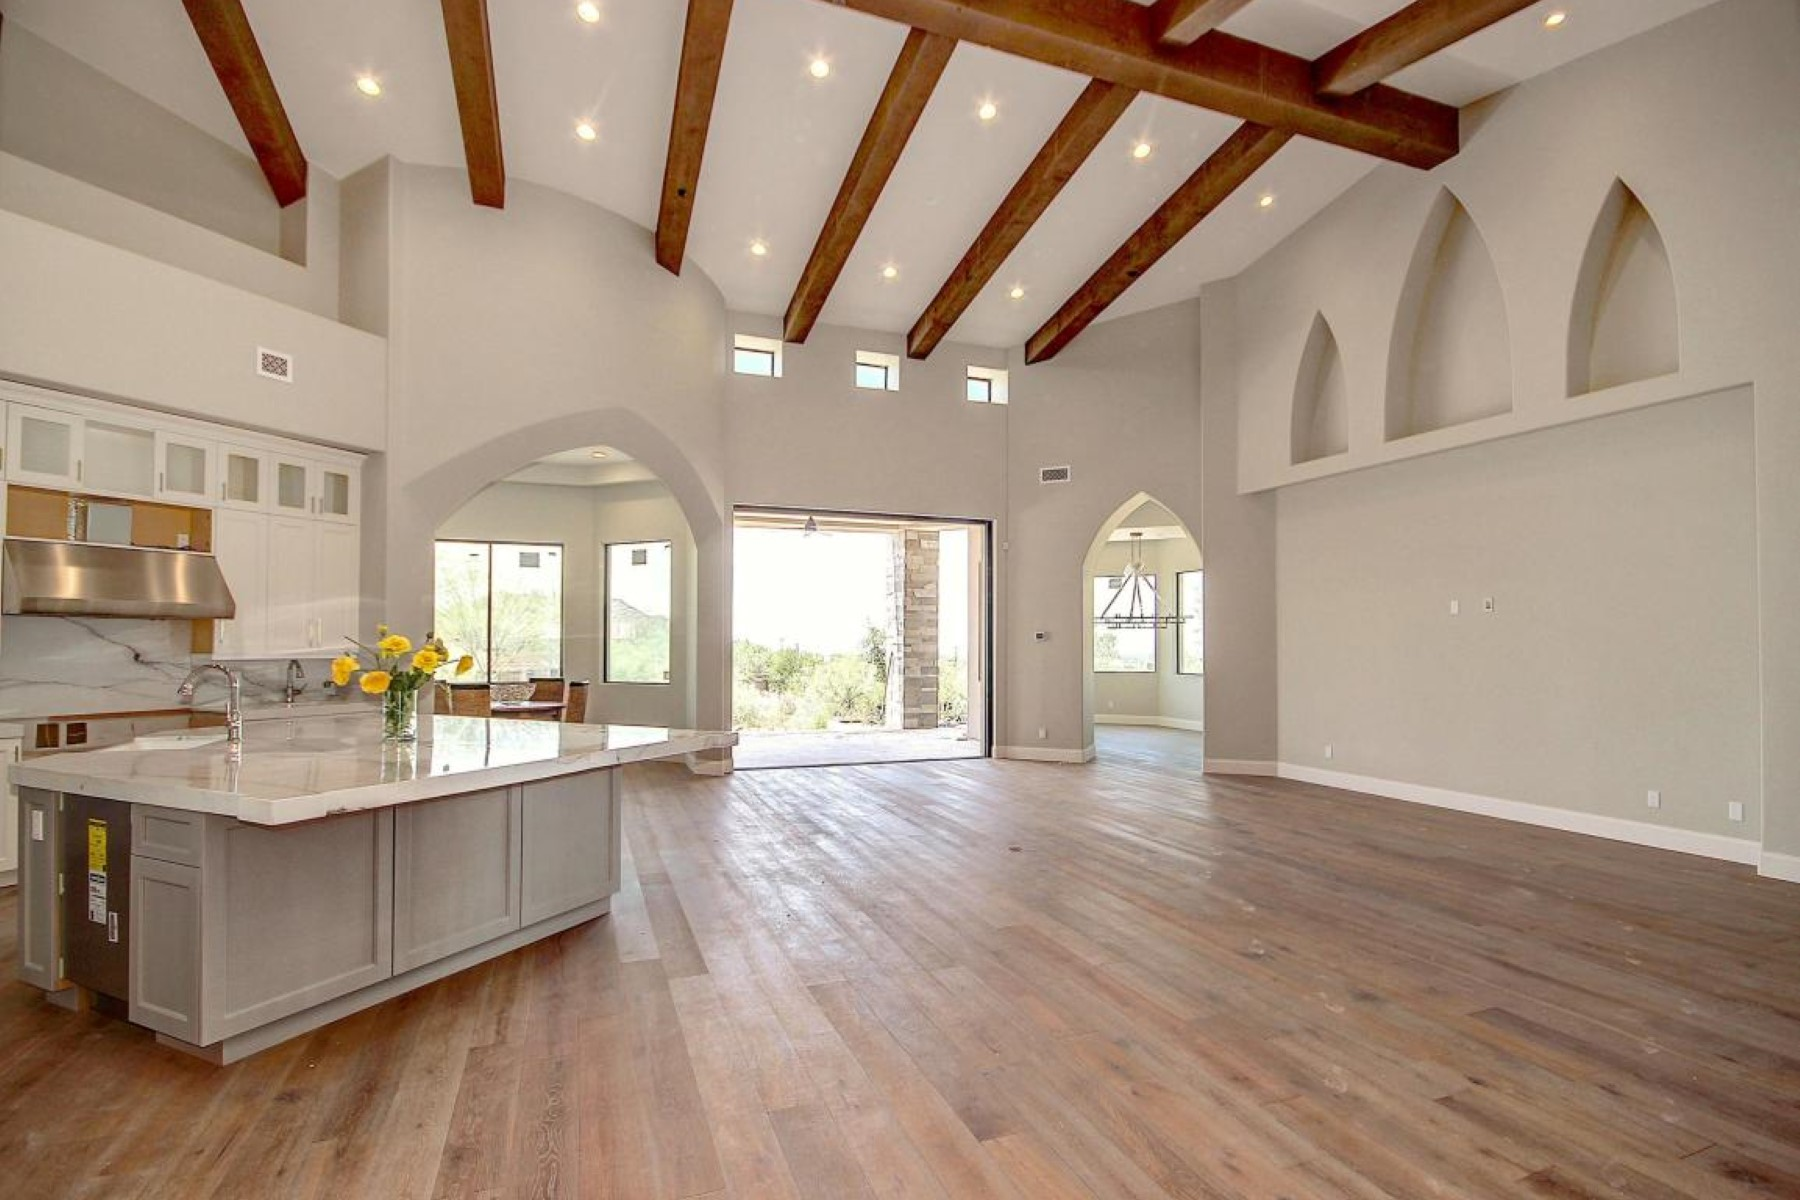 独户住宅 为 销售 在 luxuriously crafted custom masterpiece 7421 E Forest Trail Circle 梅萨, 亚利桑那州, 85207 美国